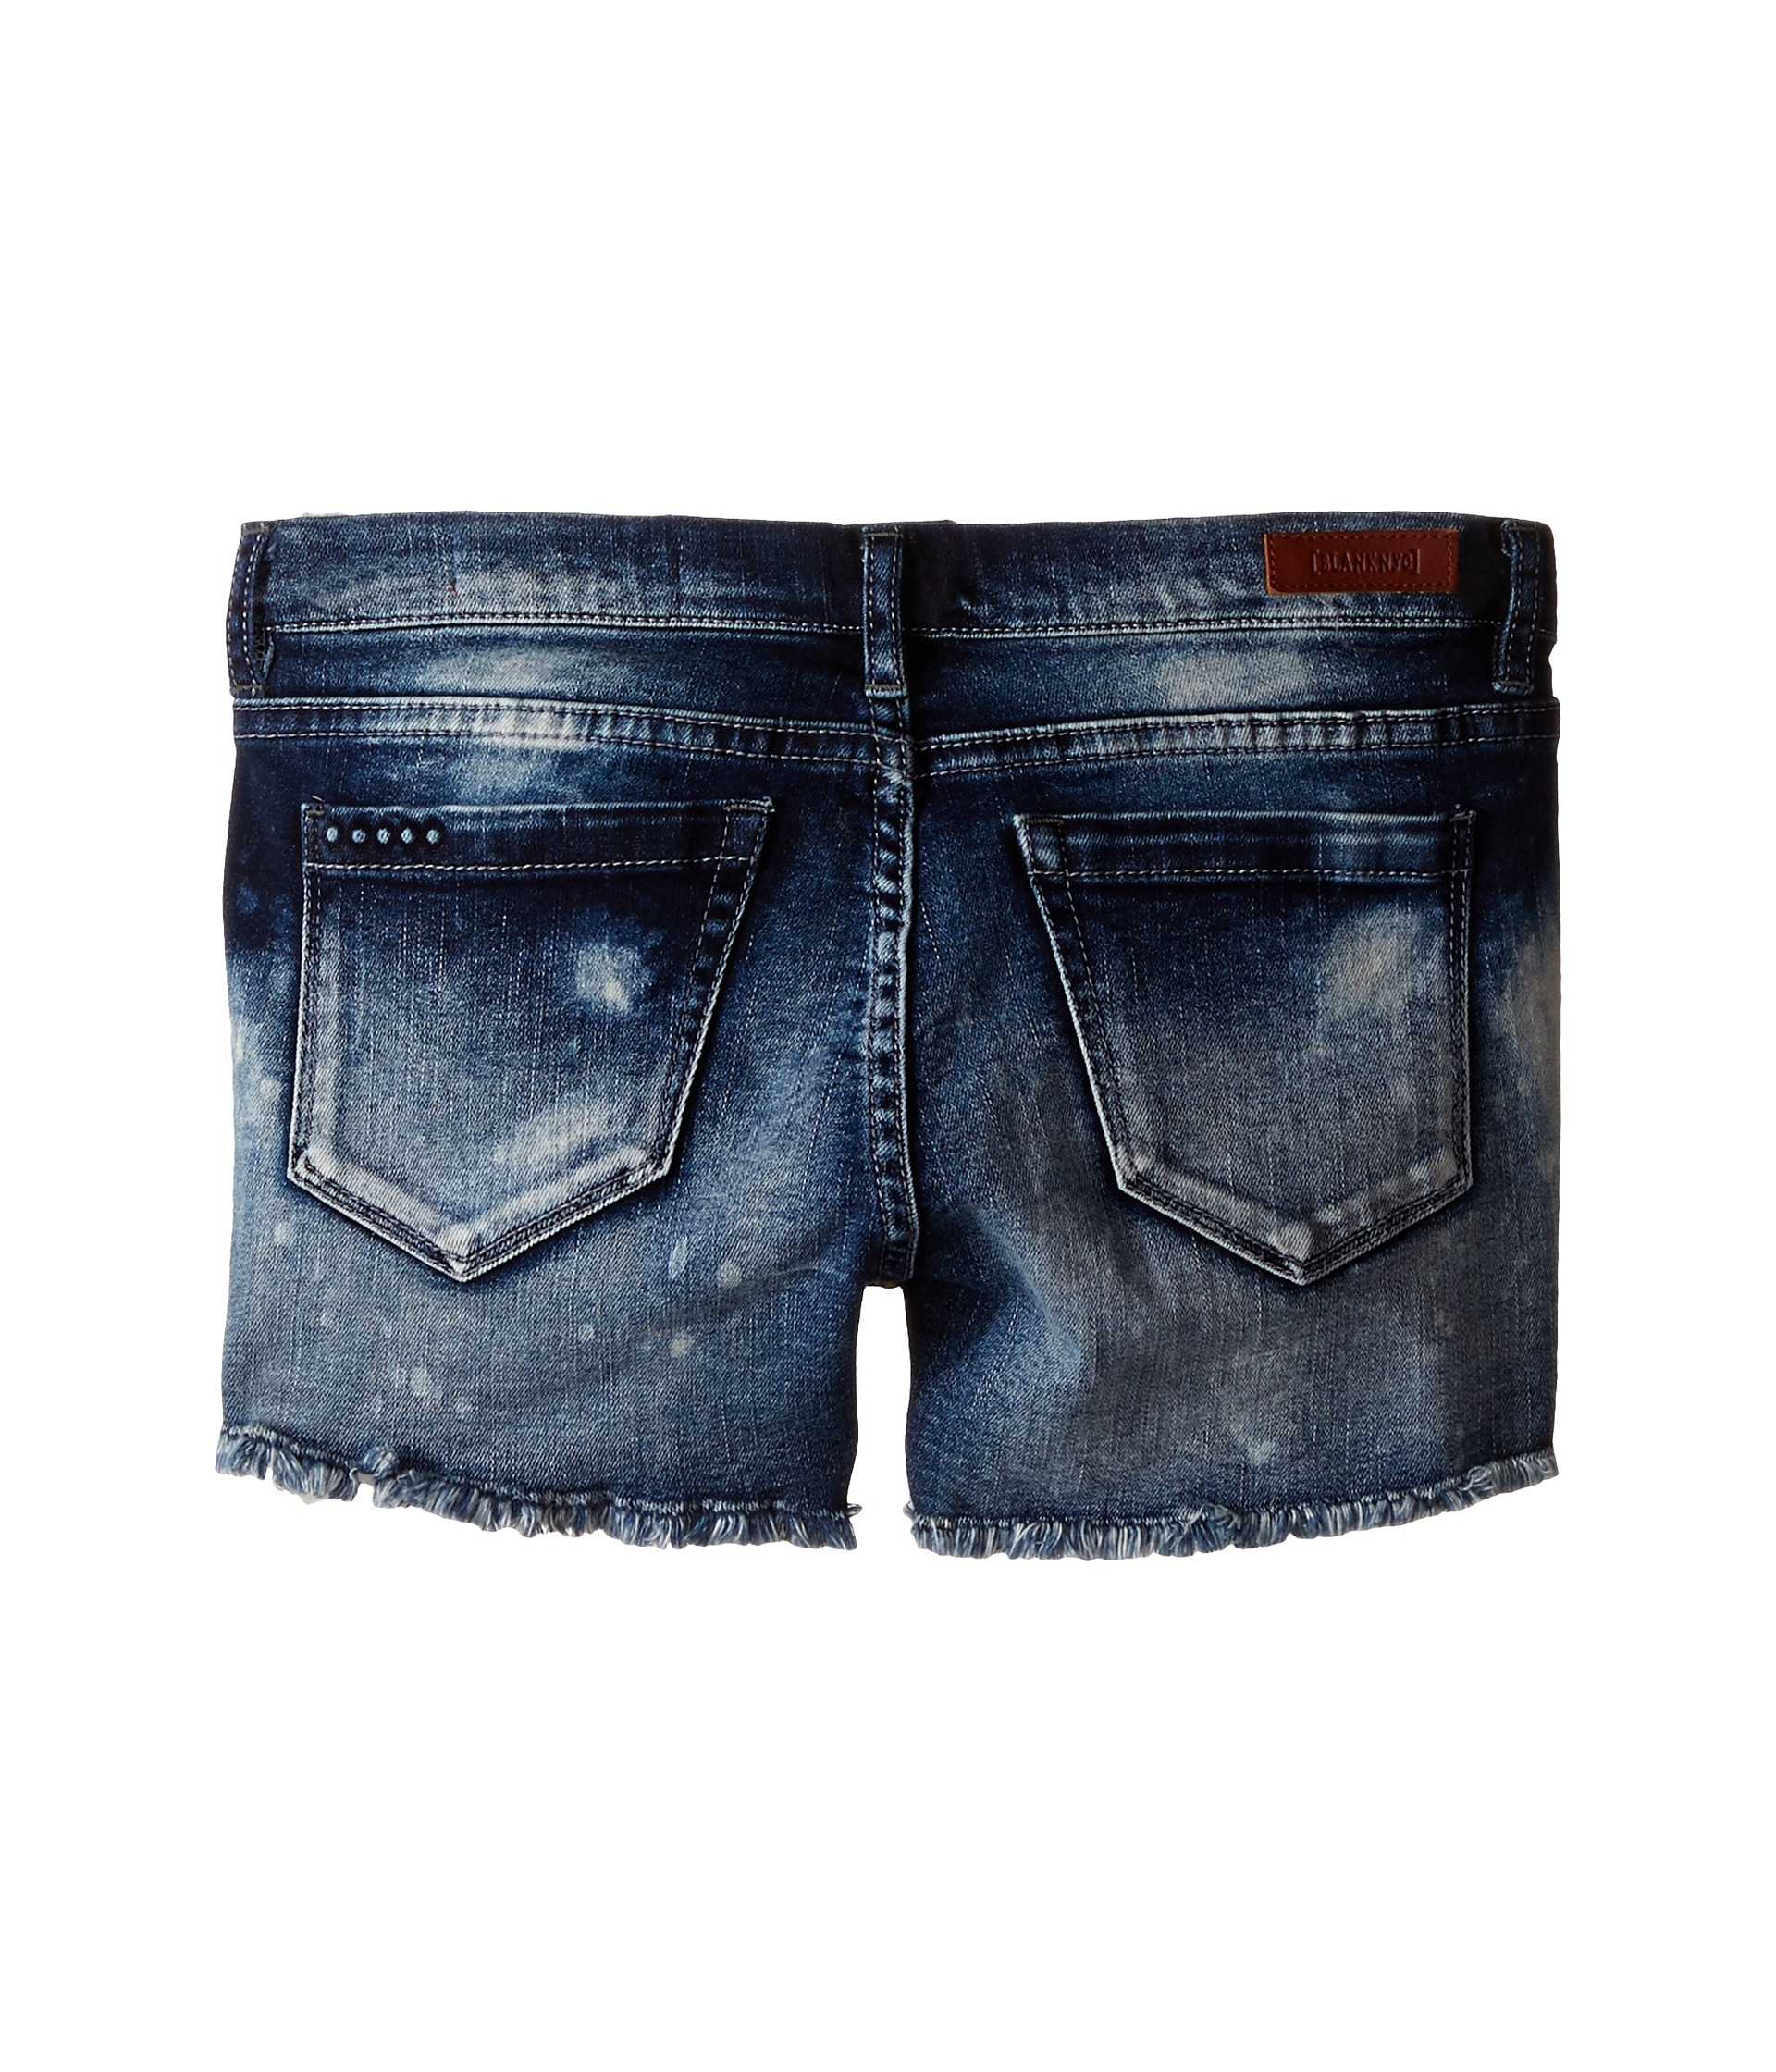 Blank NYC Kids Denim Cut Off Shorts in Rufus (Big Kids) - Zappos.com Free Shipping BOTH Ways